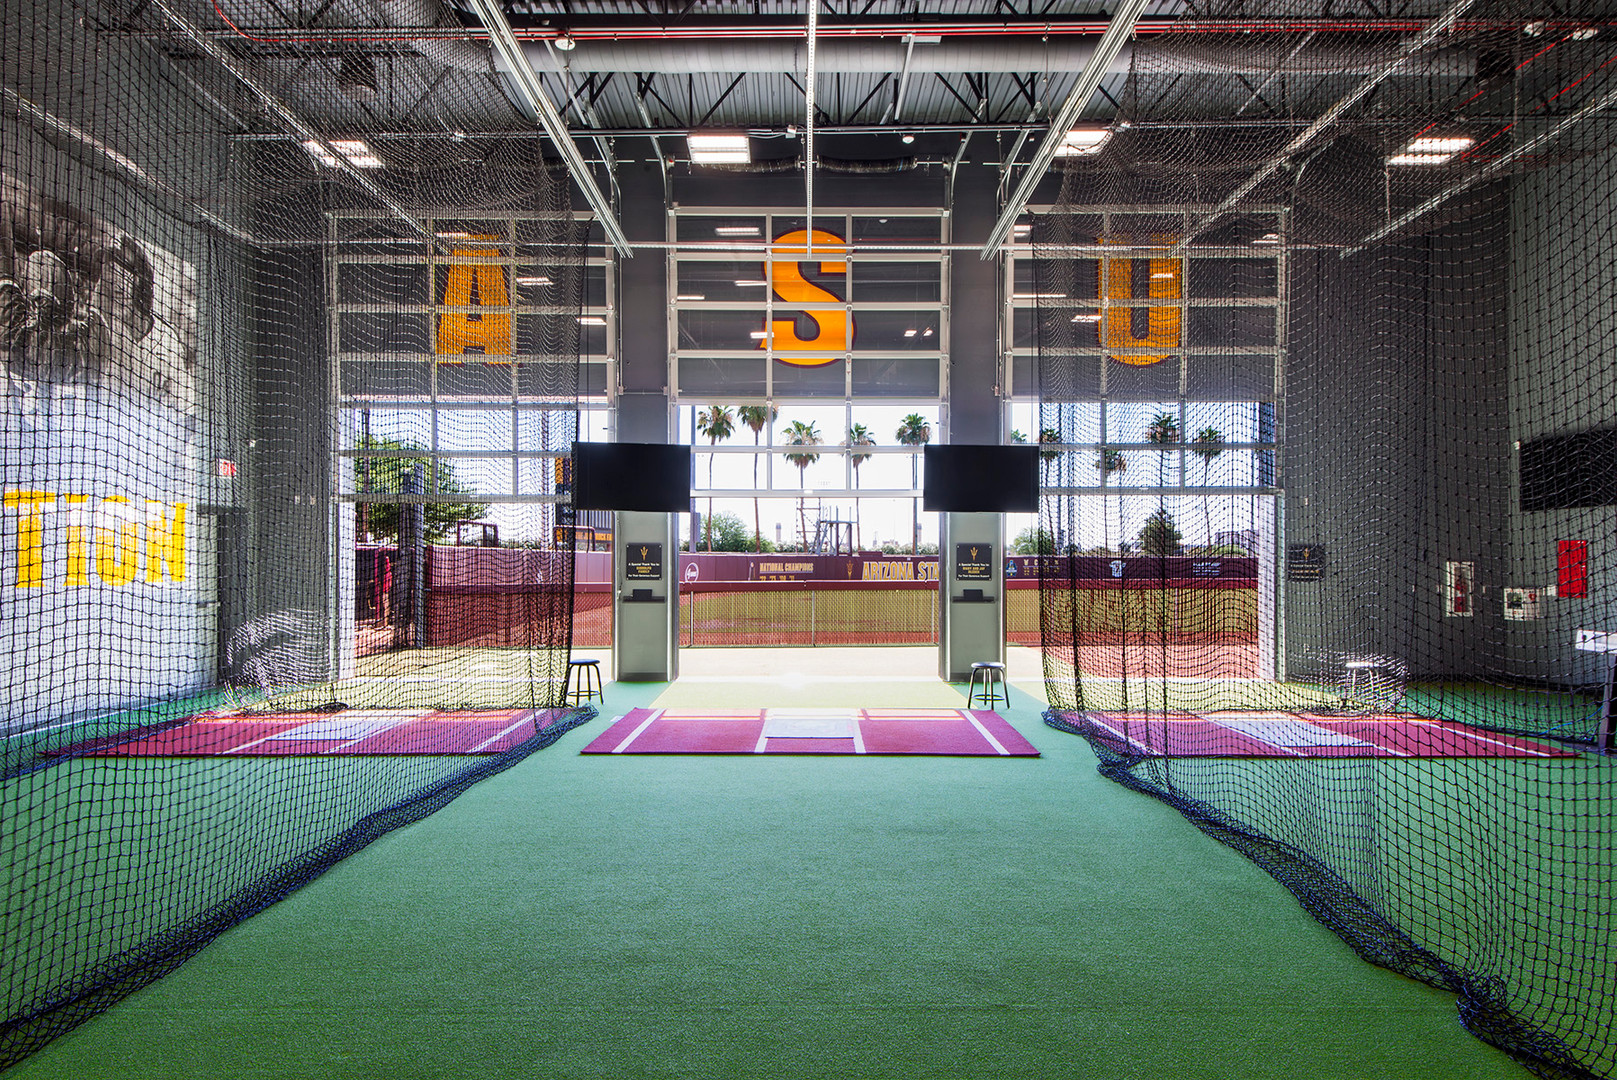 ASU Softball-09 new.jpg